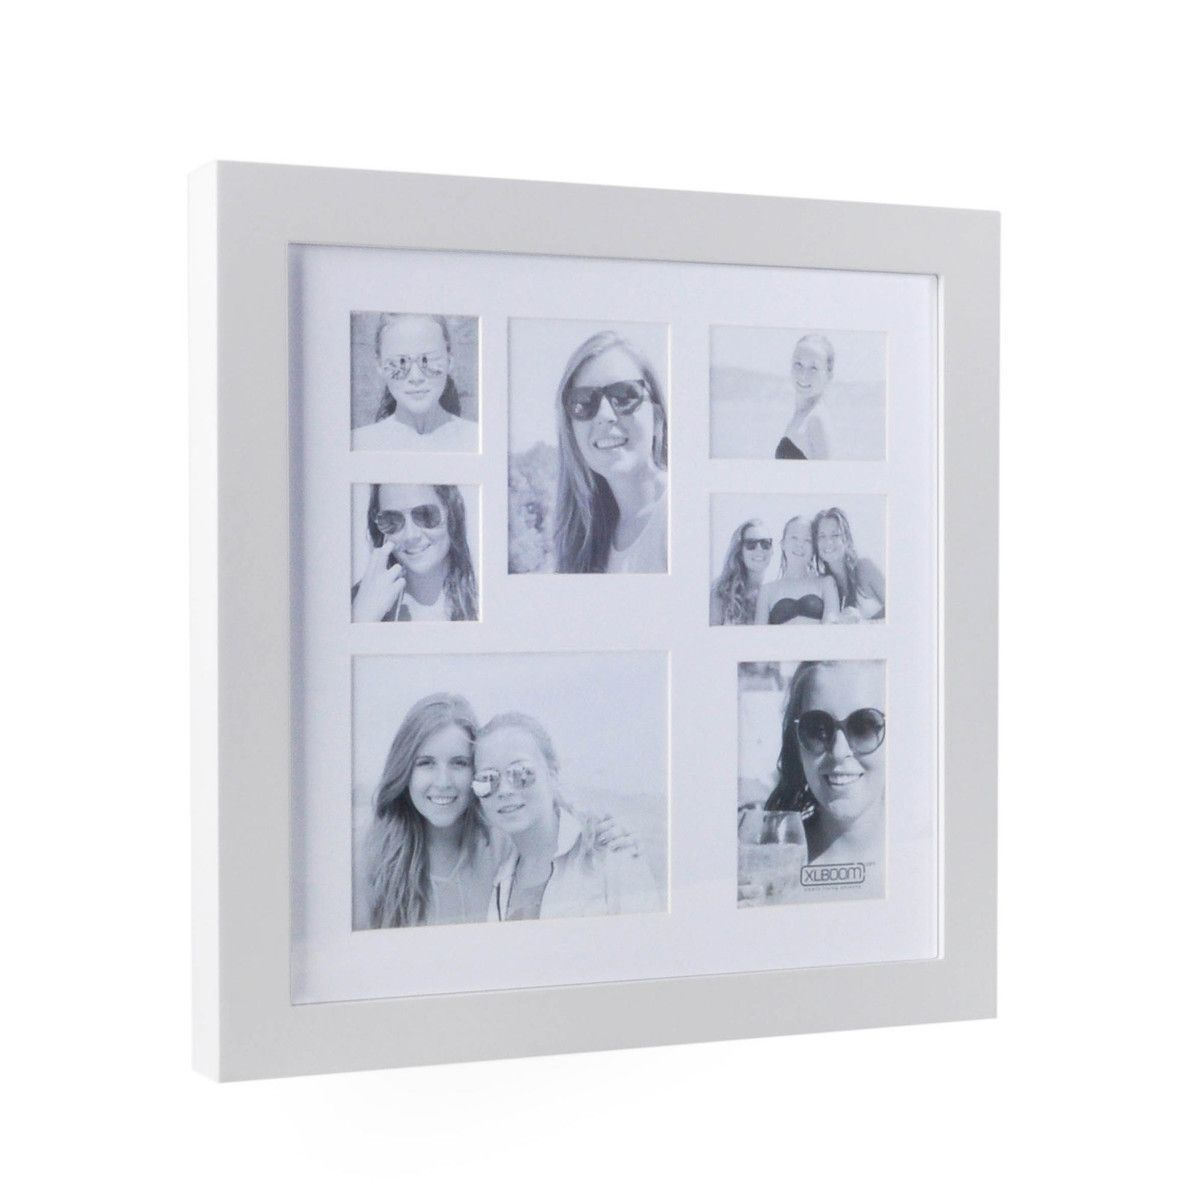 Tolle Osu Bilderrahmen Fotos - Familienfoto Kunst Ideen ...